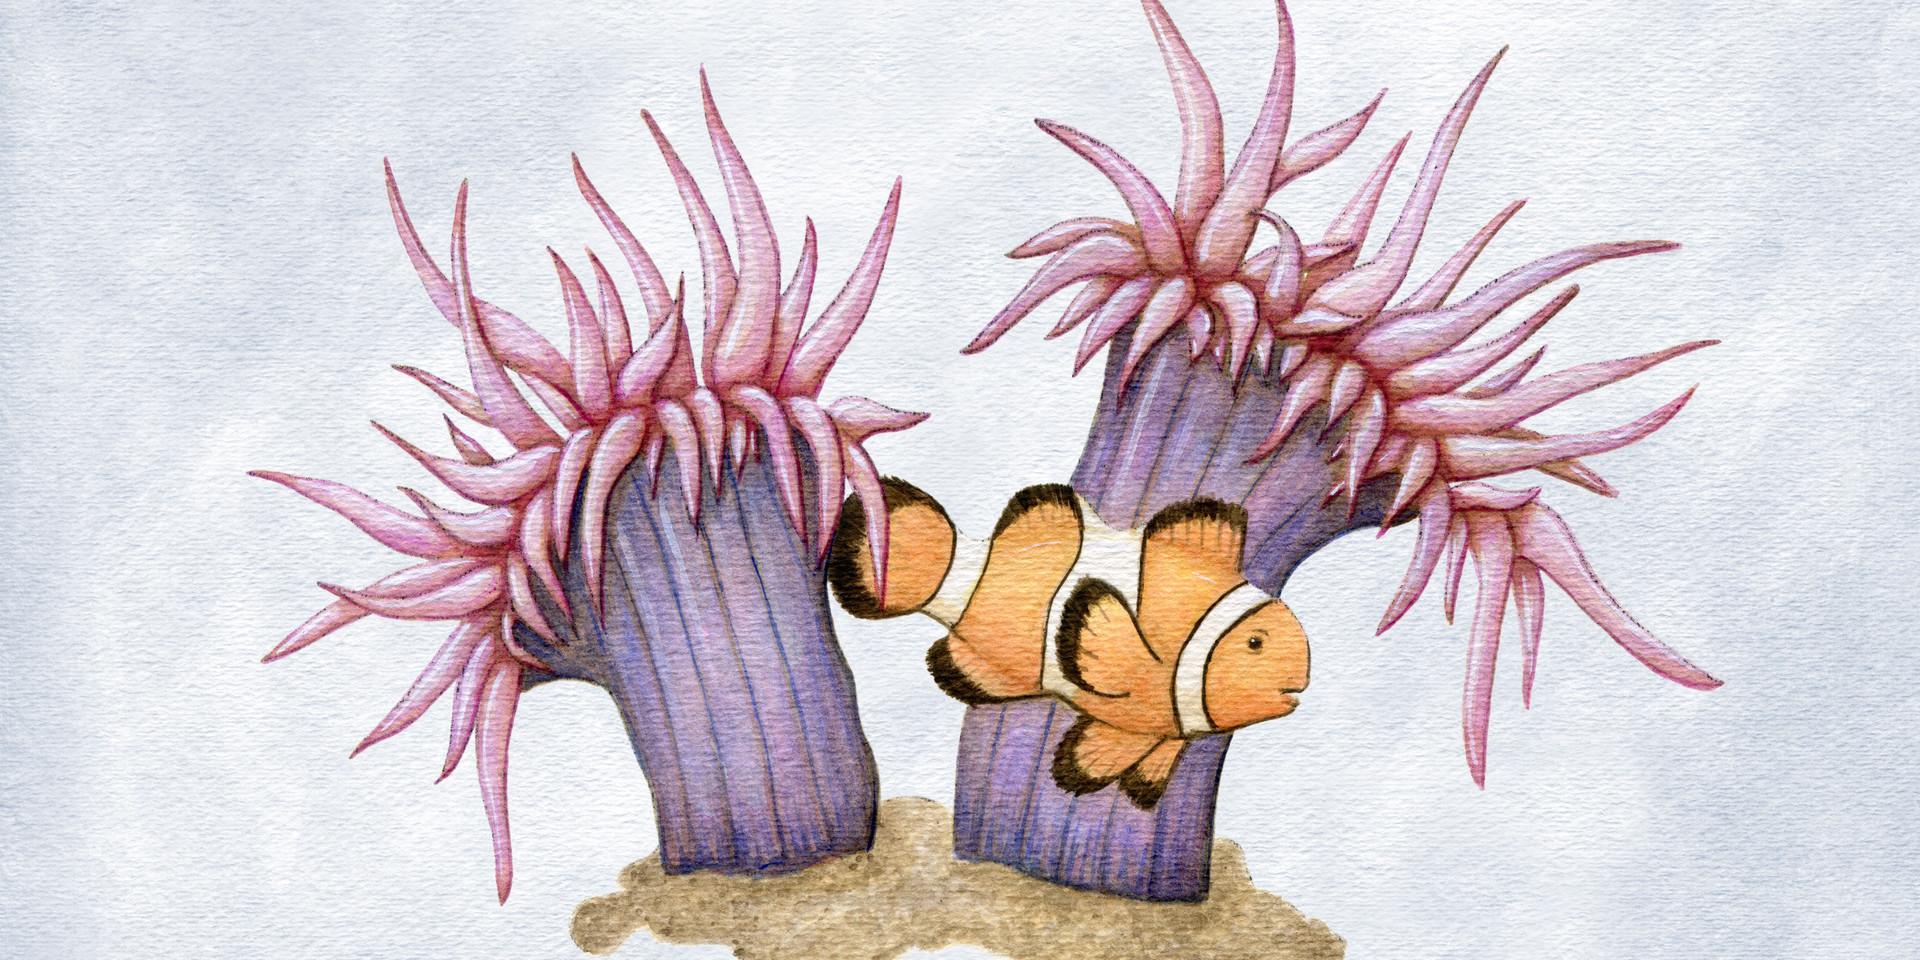 Sea Anemones and Clown Fish